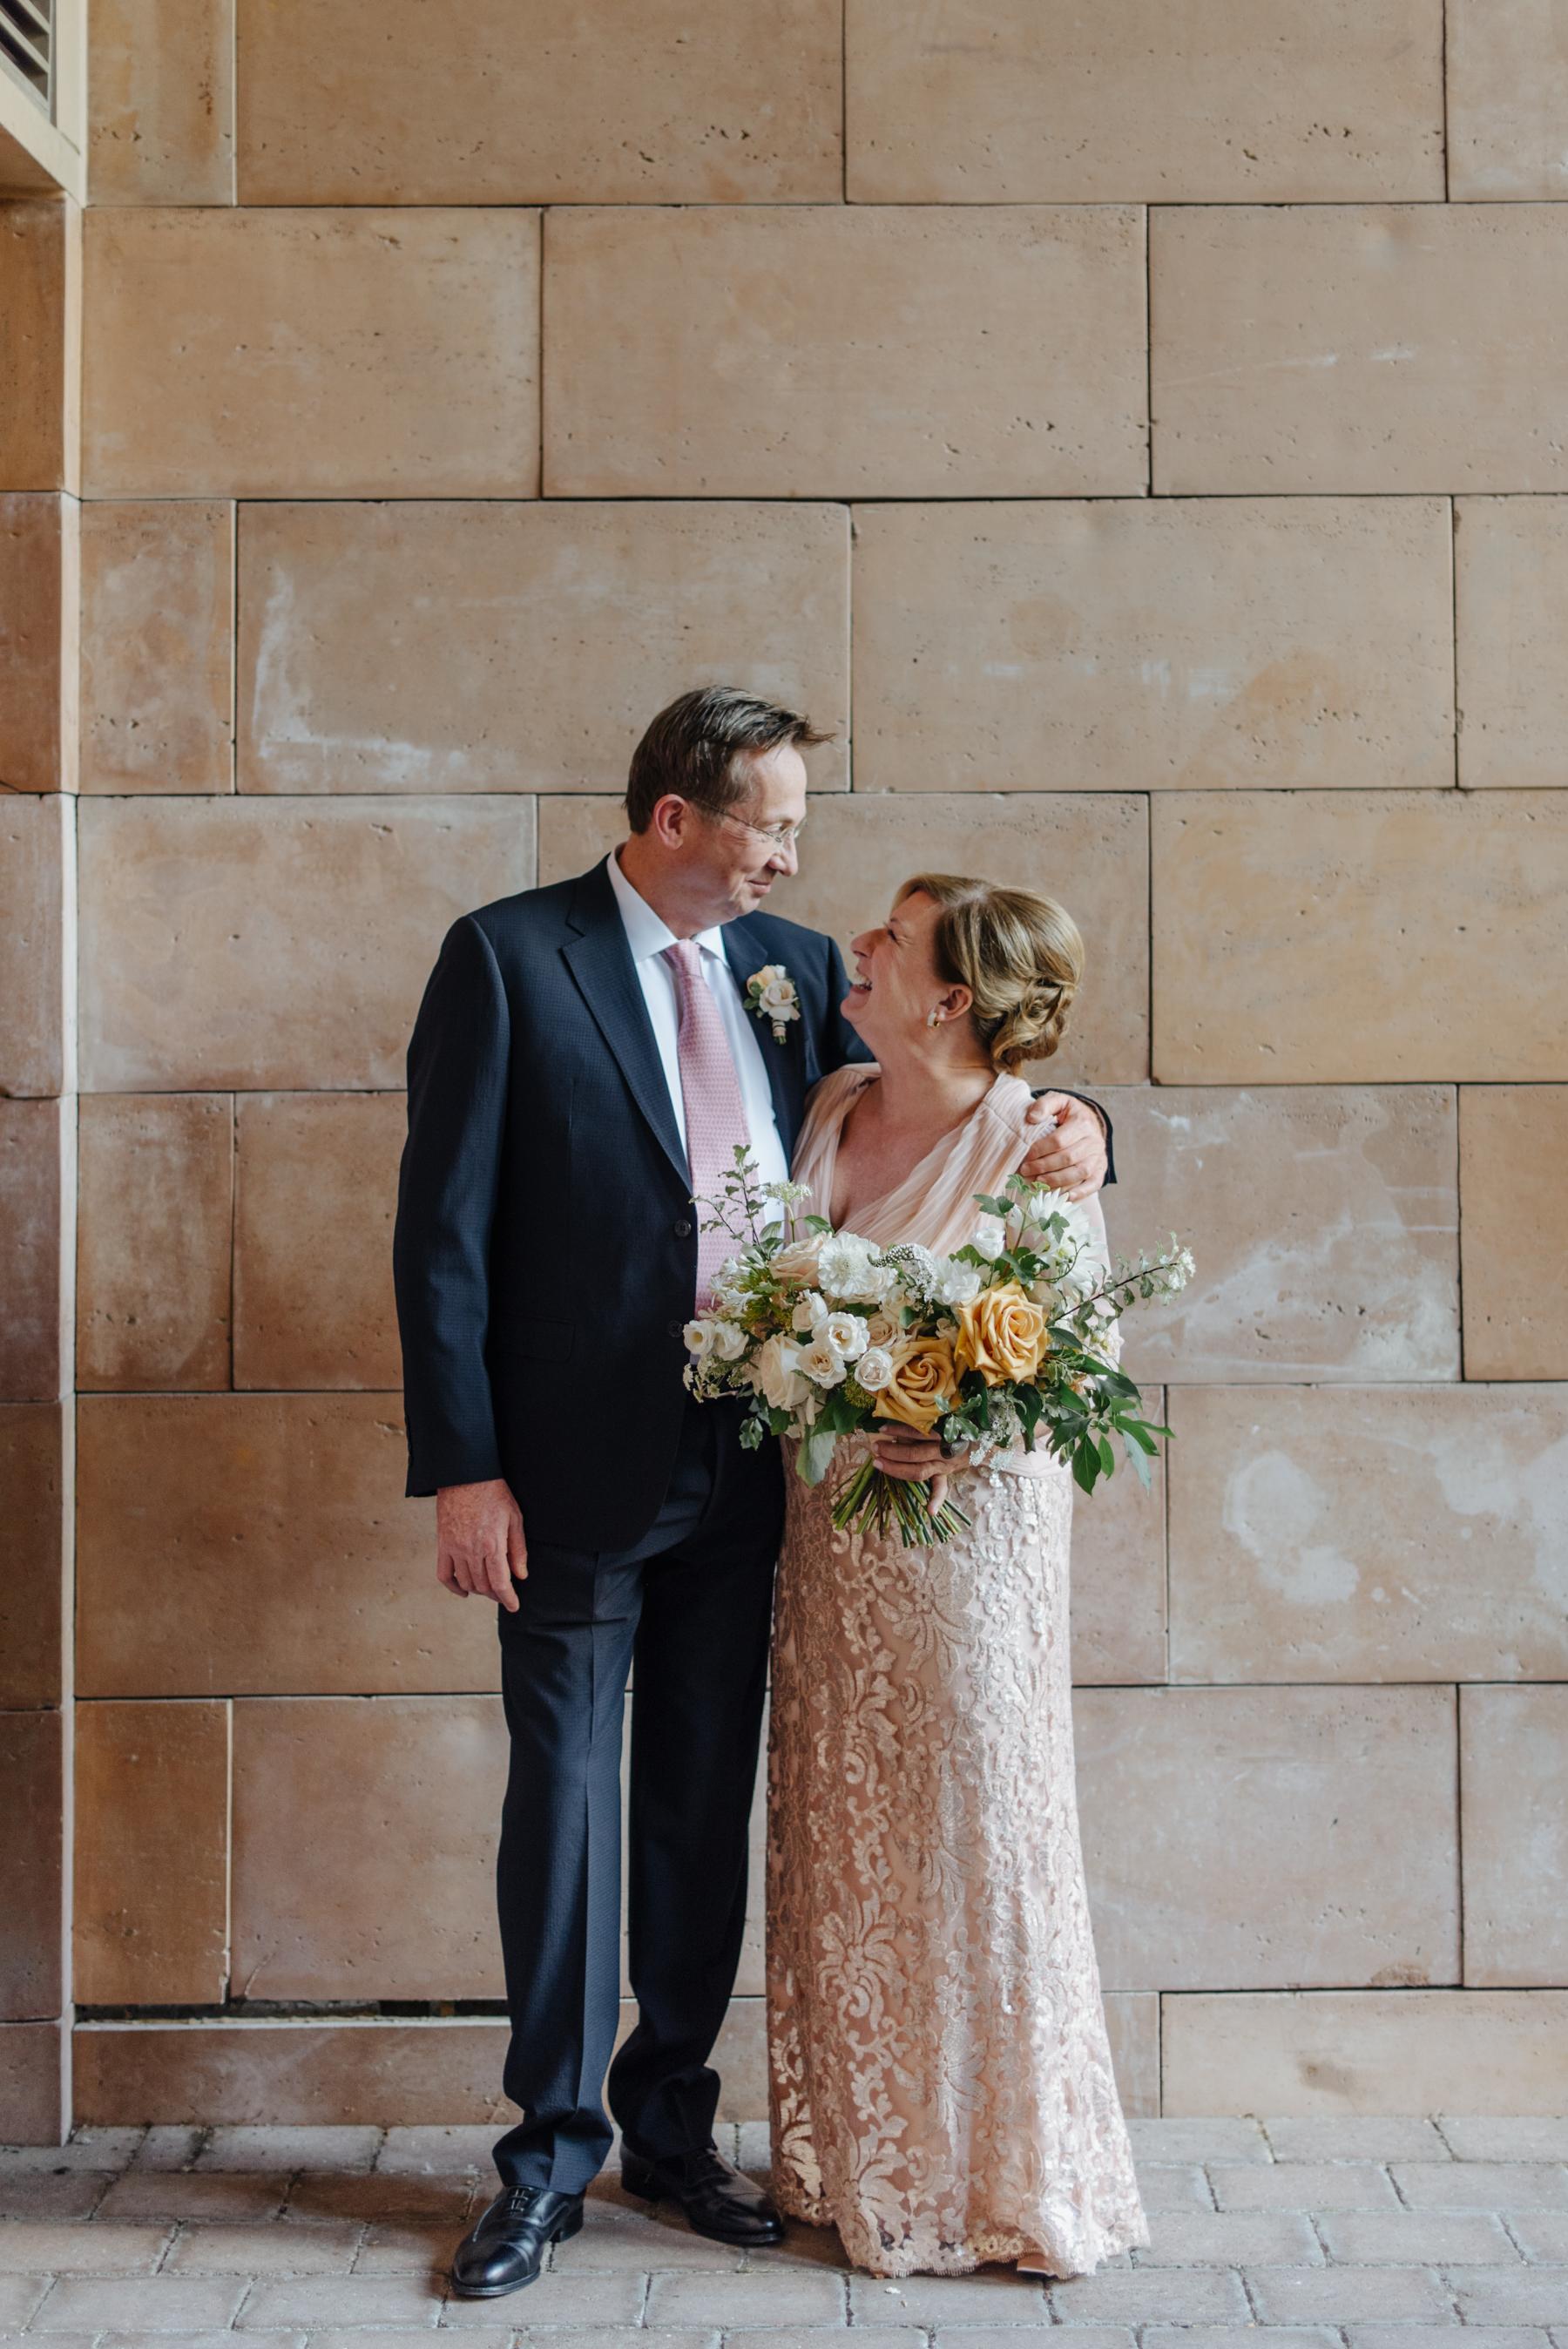 kaoverii_silva_photographer_cynthia_richard_wedding_vancouver_brix_&_mortar-6.jpg